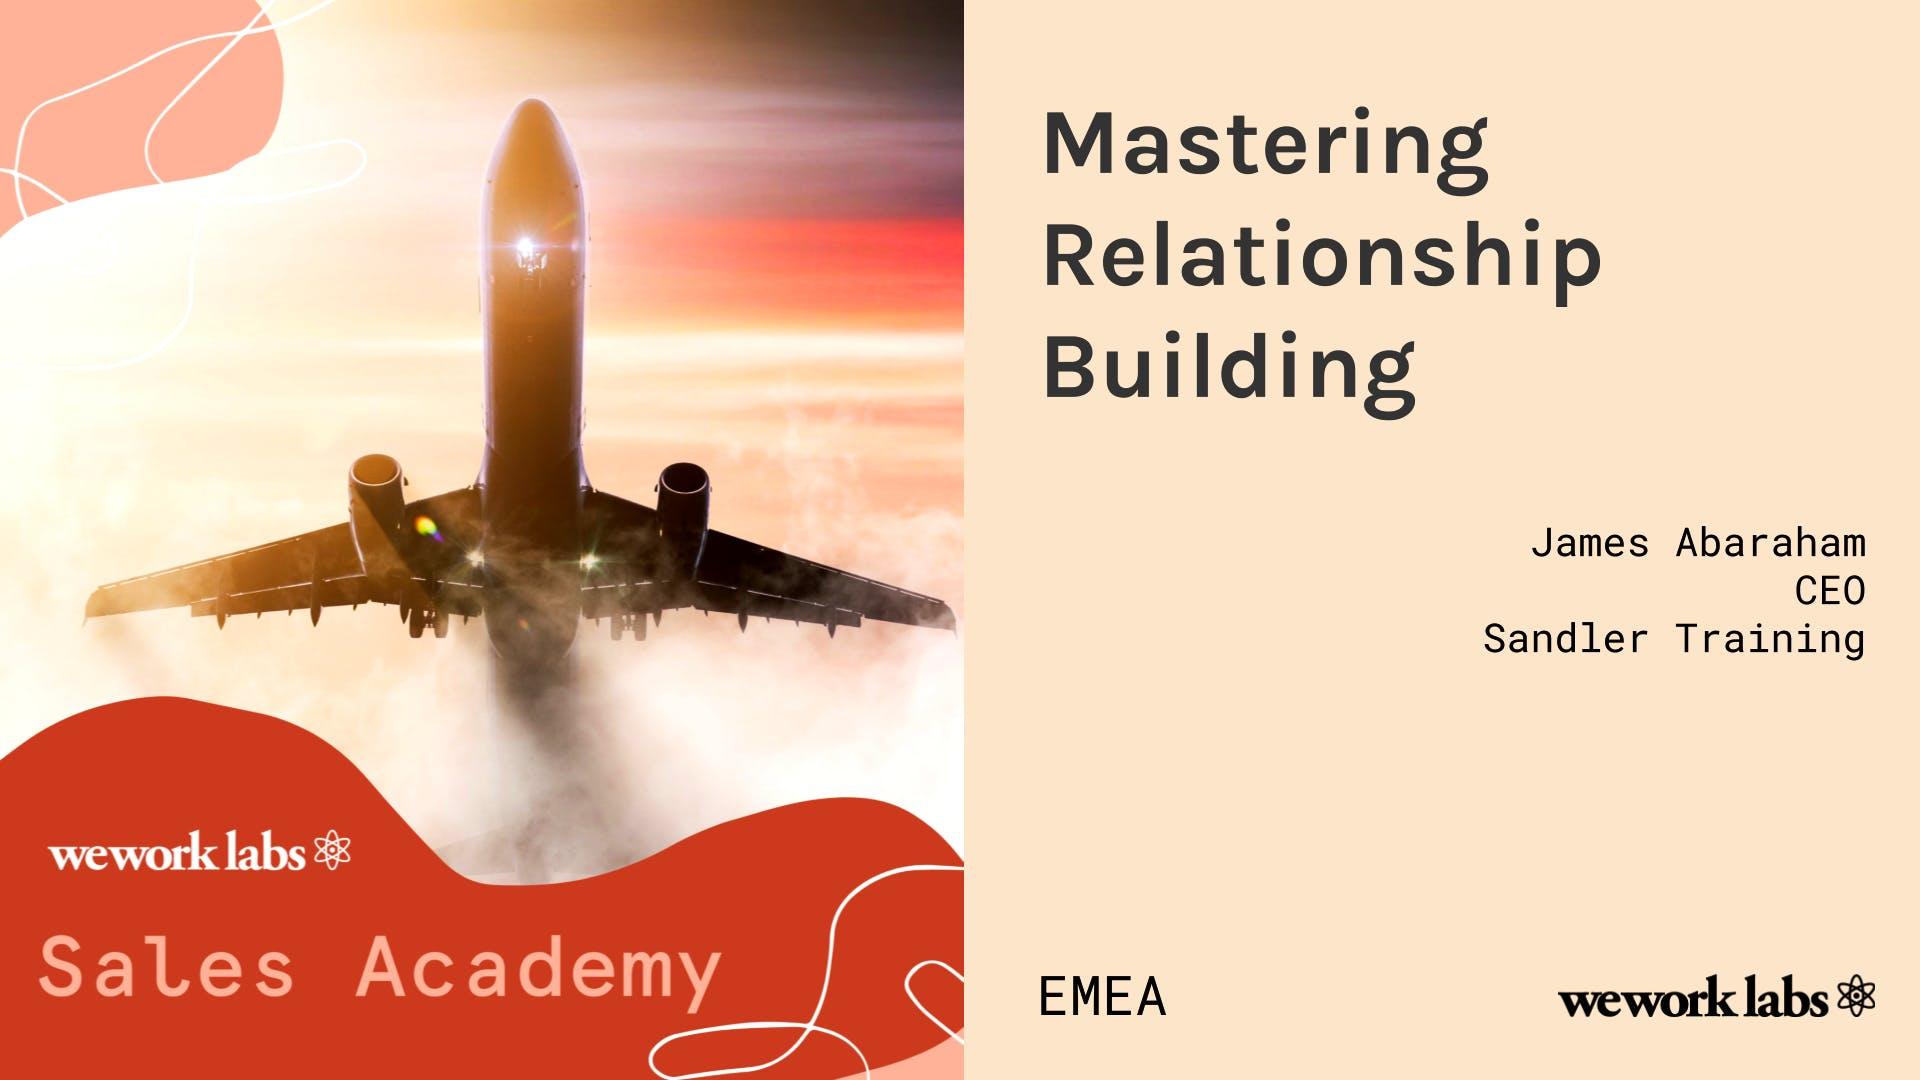 Sales Academy (EMEA): Mastering Relationship Building